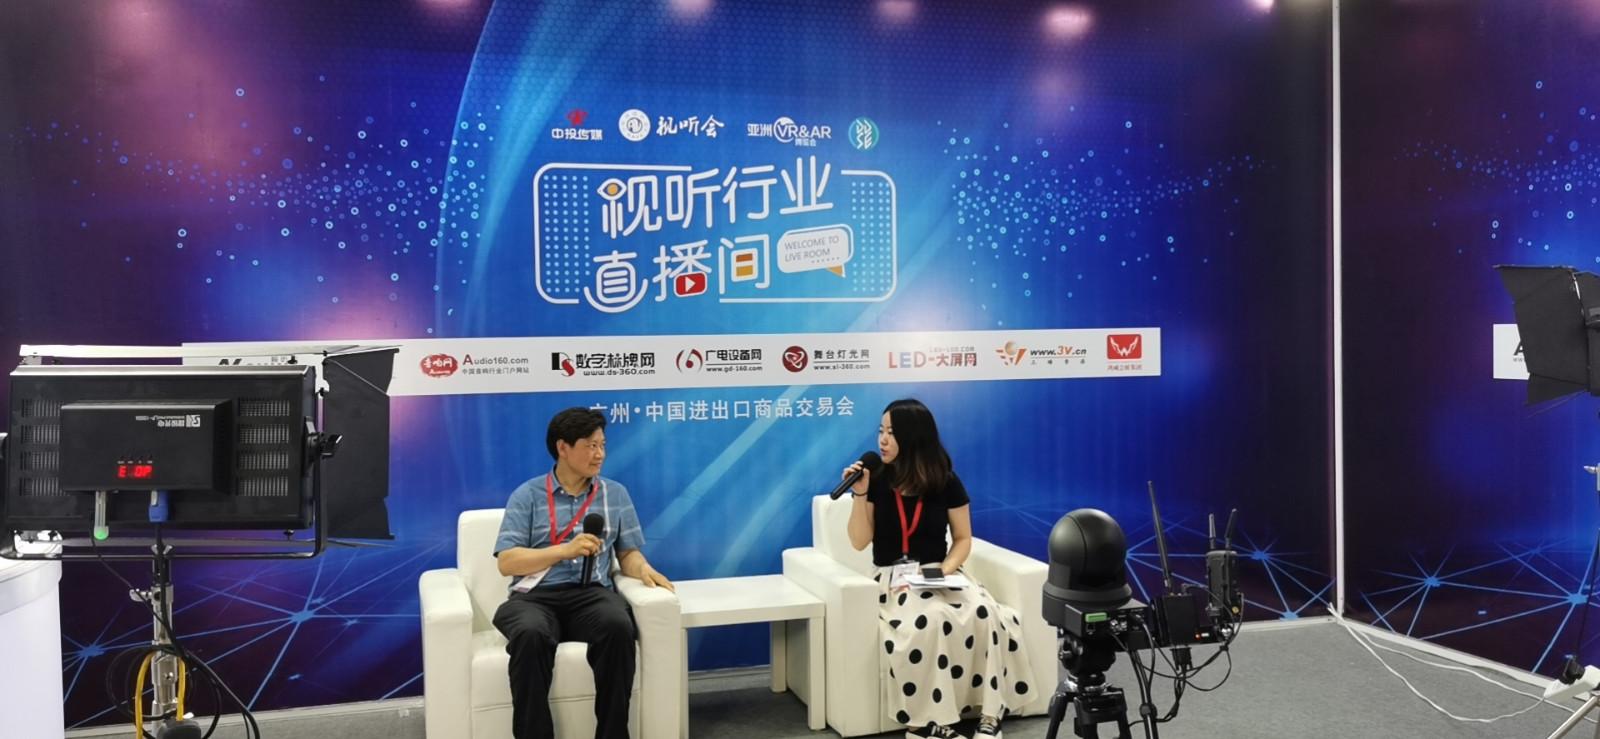 news-XY Screens-Exhibition of Xiong-Yun Audio-Visual Equipment Co, Ltd-img-2